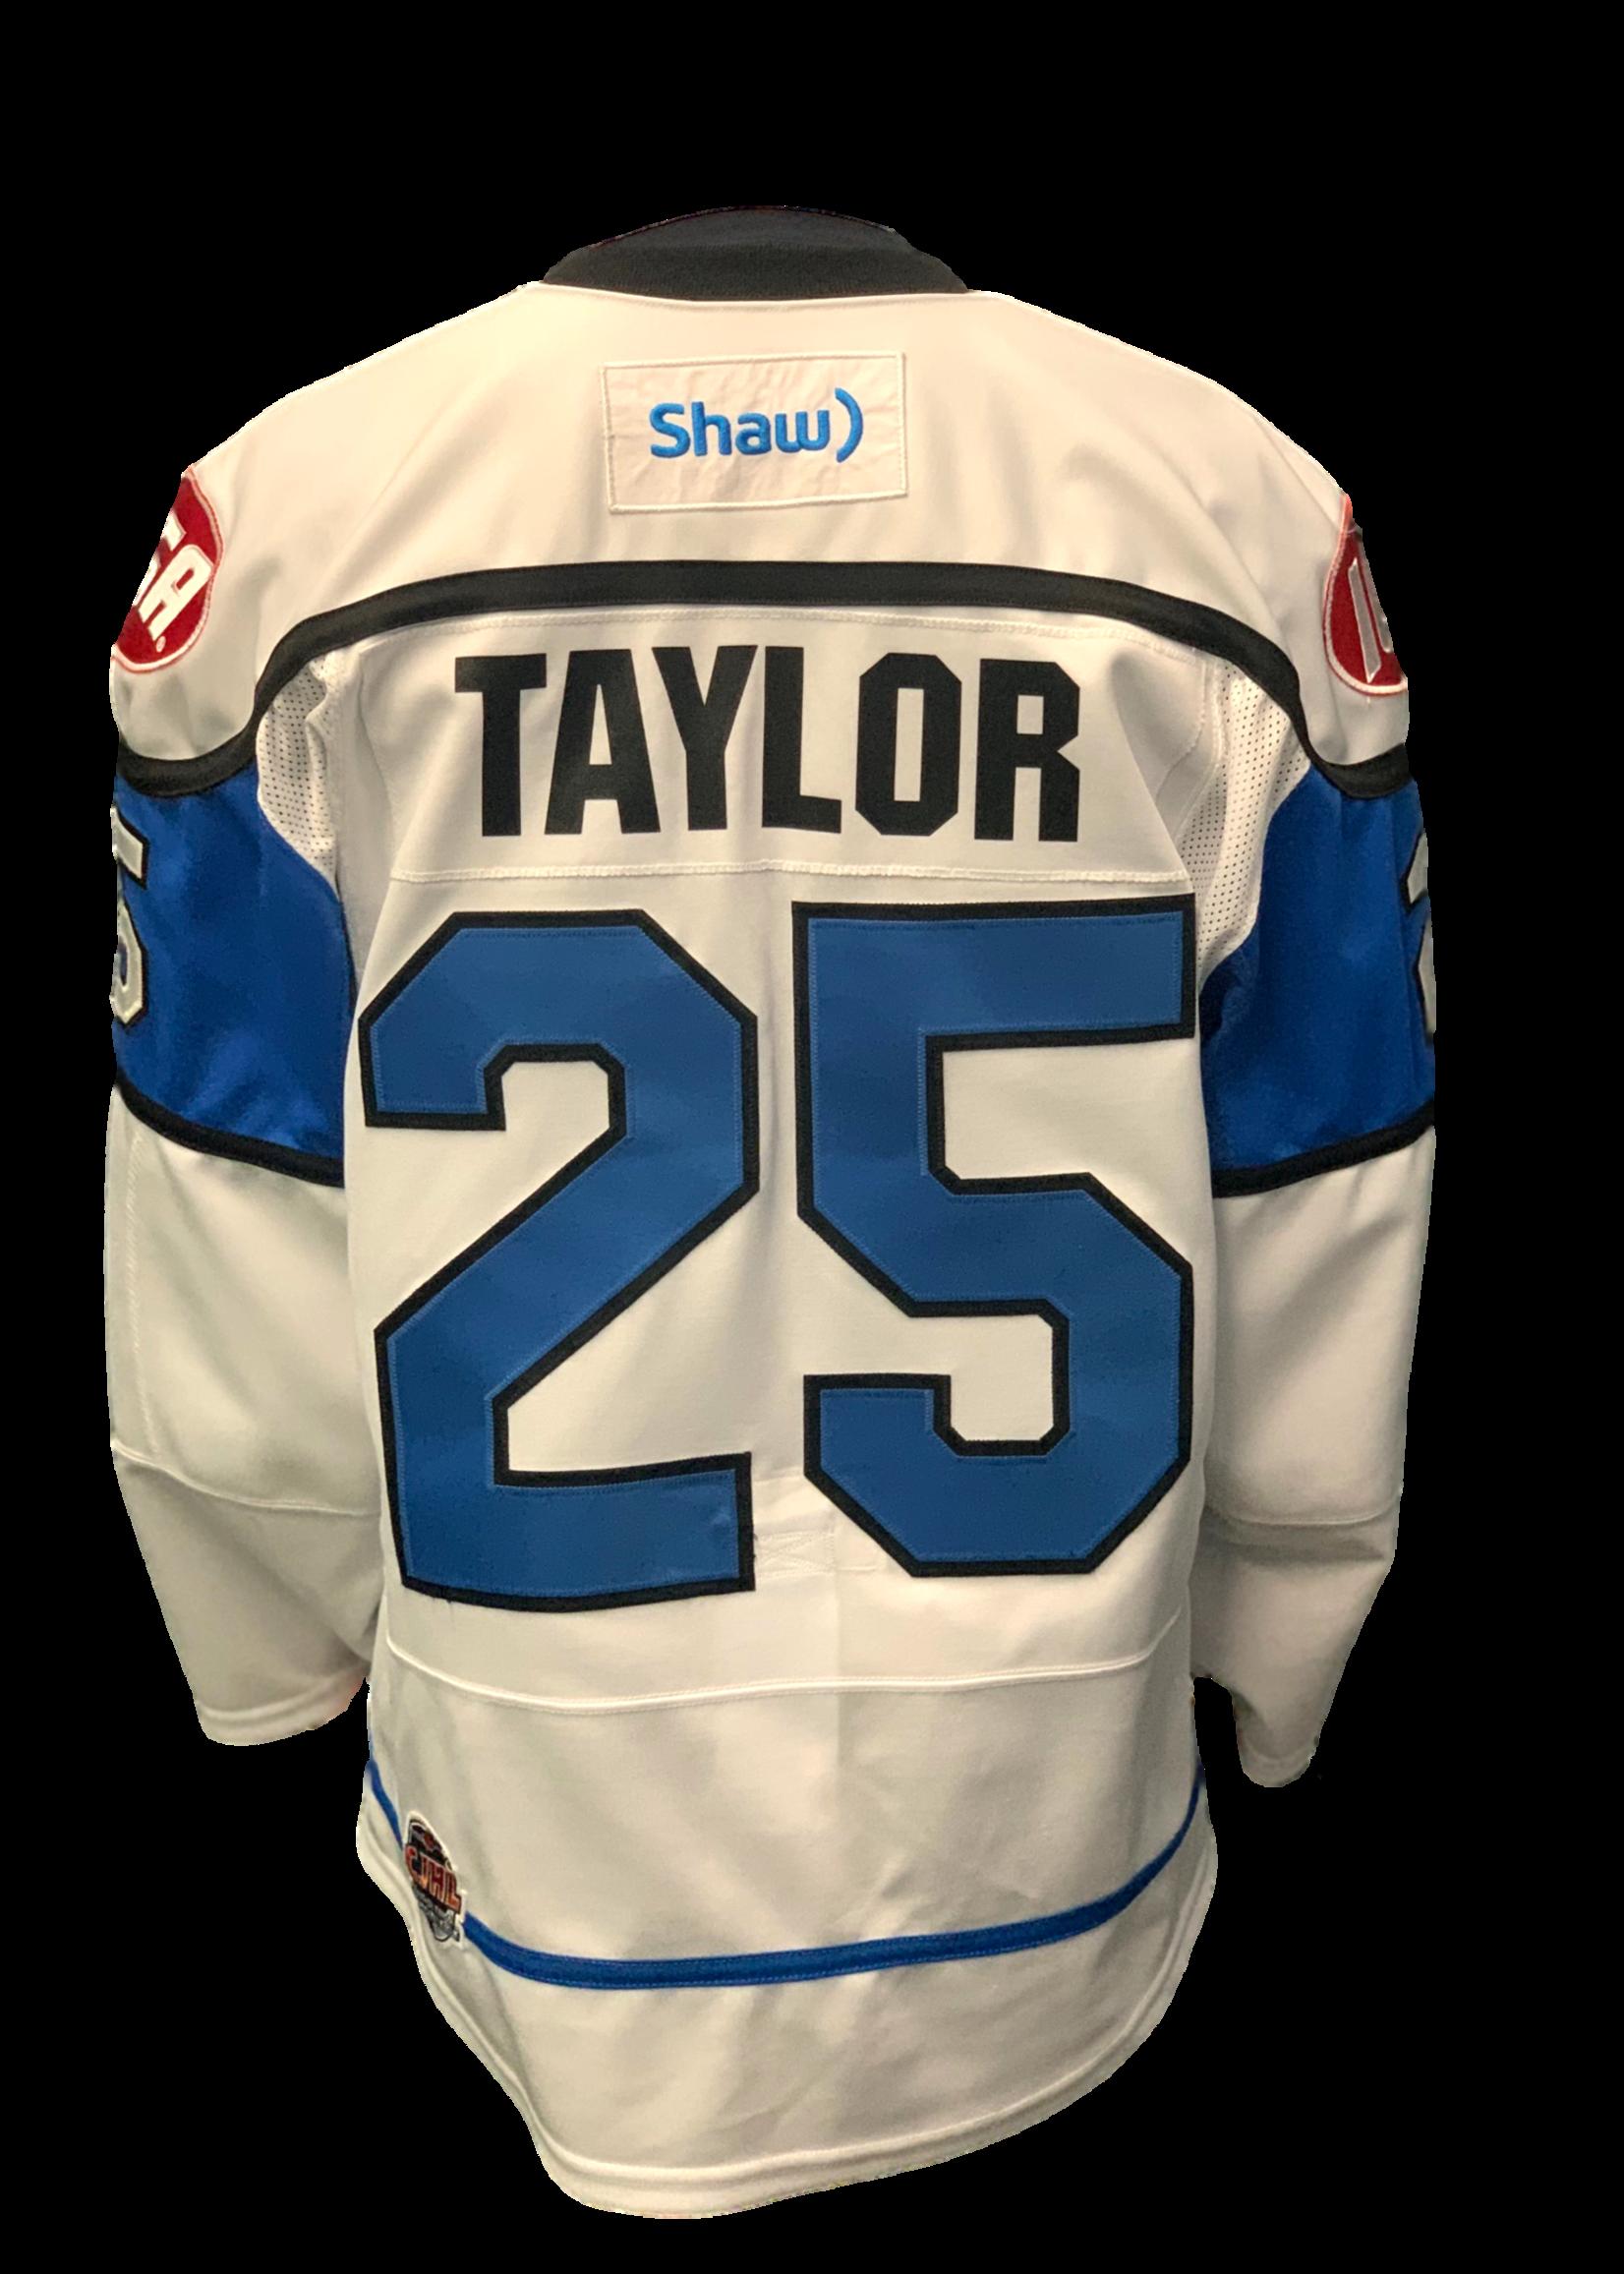 Bauer Kale Taylor Game-Worn Jersey -Team Signed